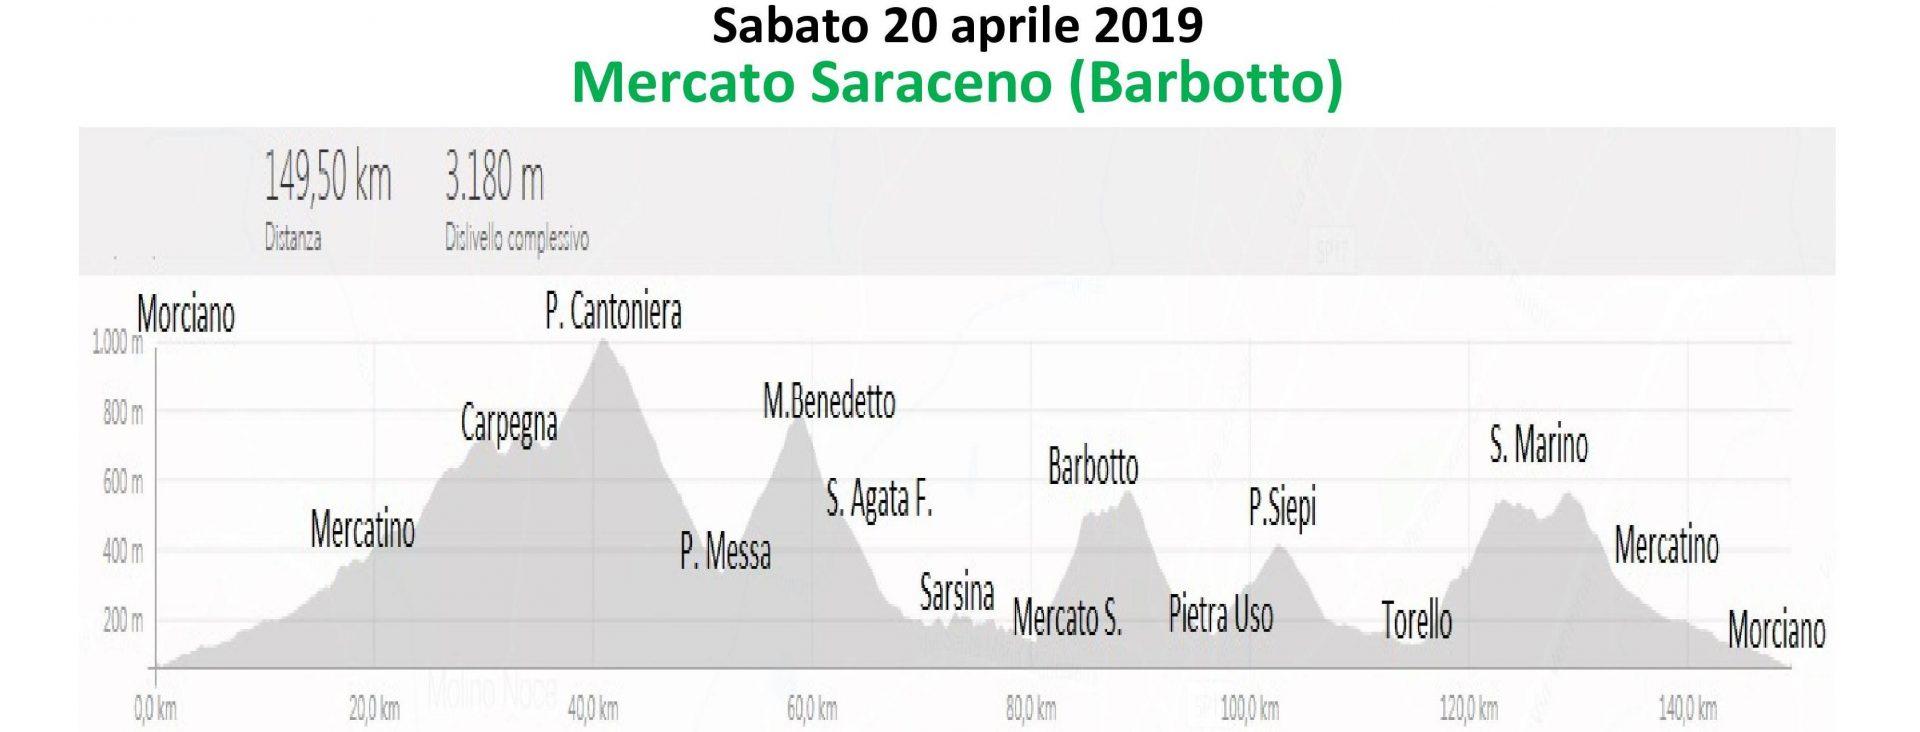 Sabato 20-apr-2019 Pestigino 2° Prova – Barbotto